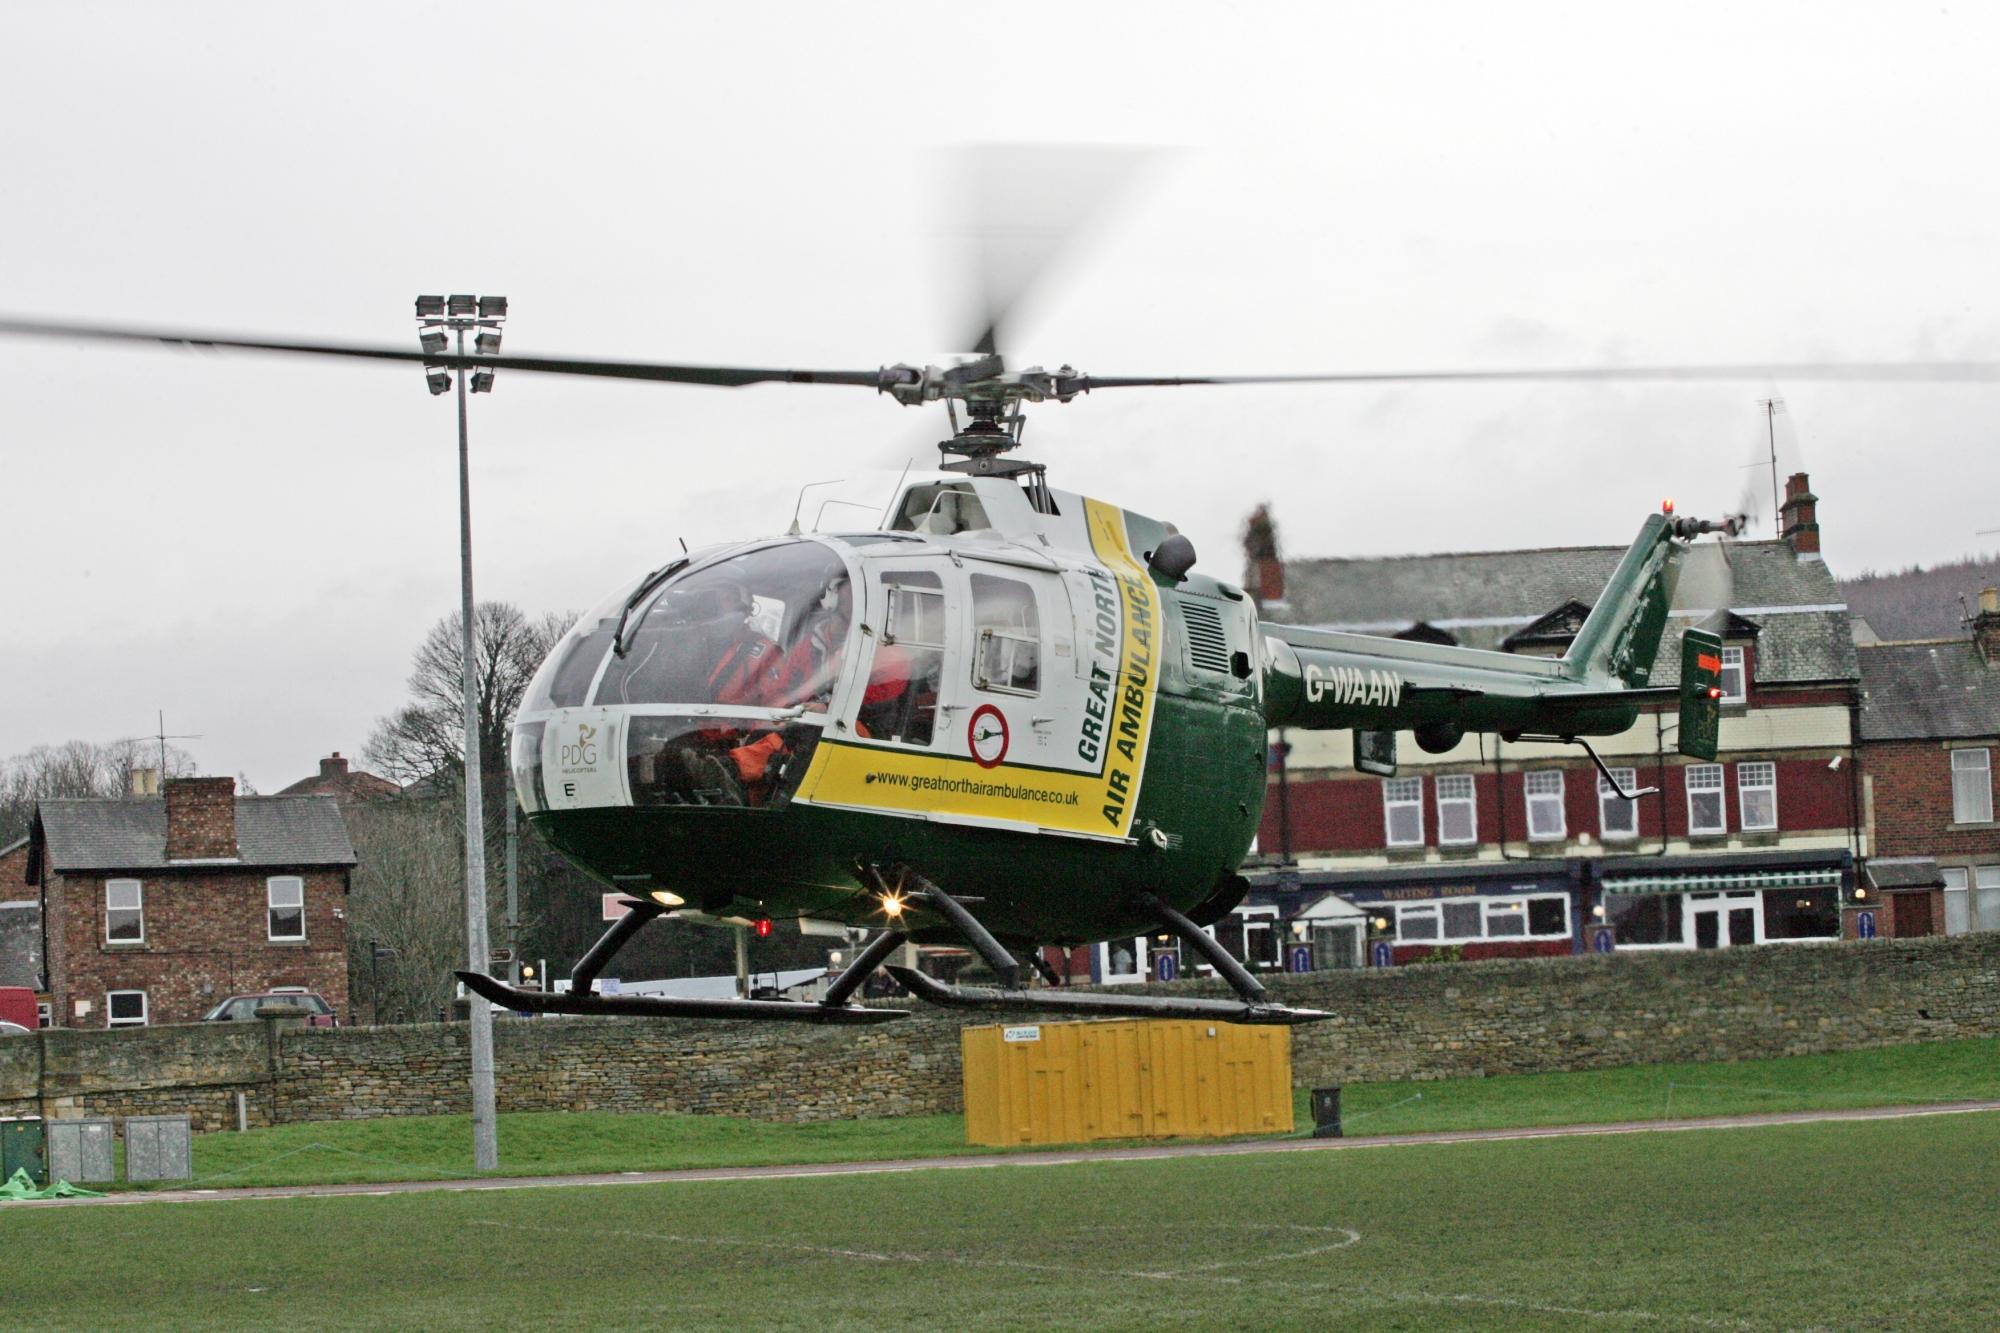 G-WAAN helicopter in flight